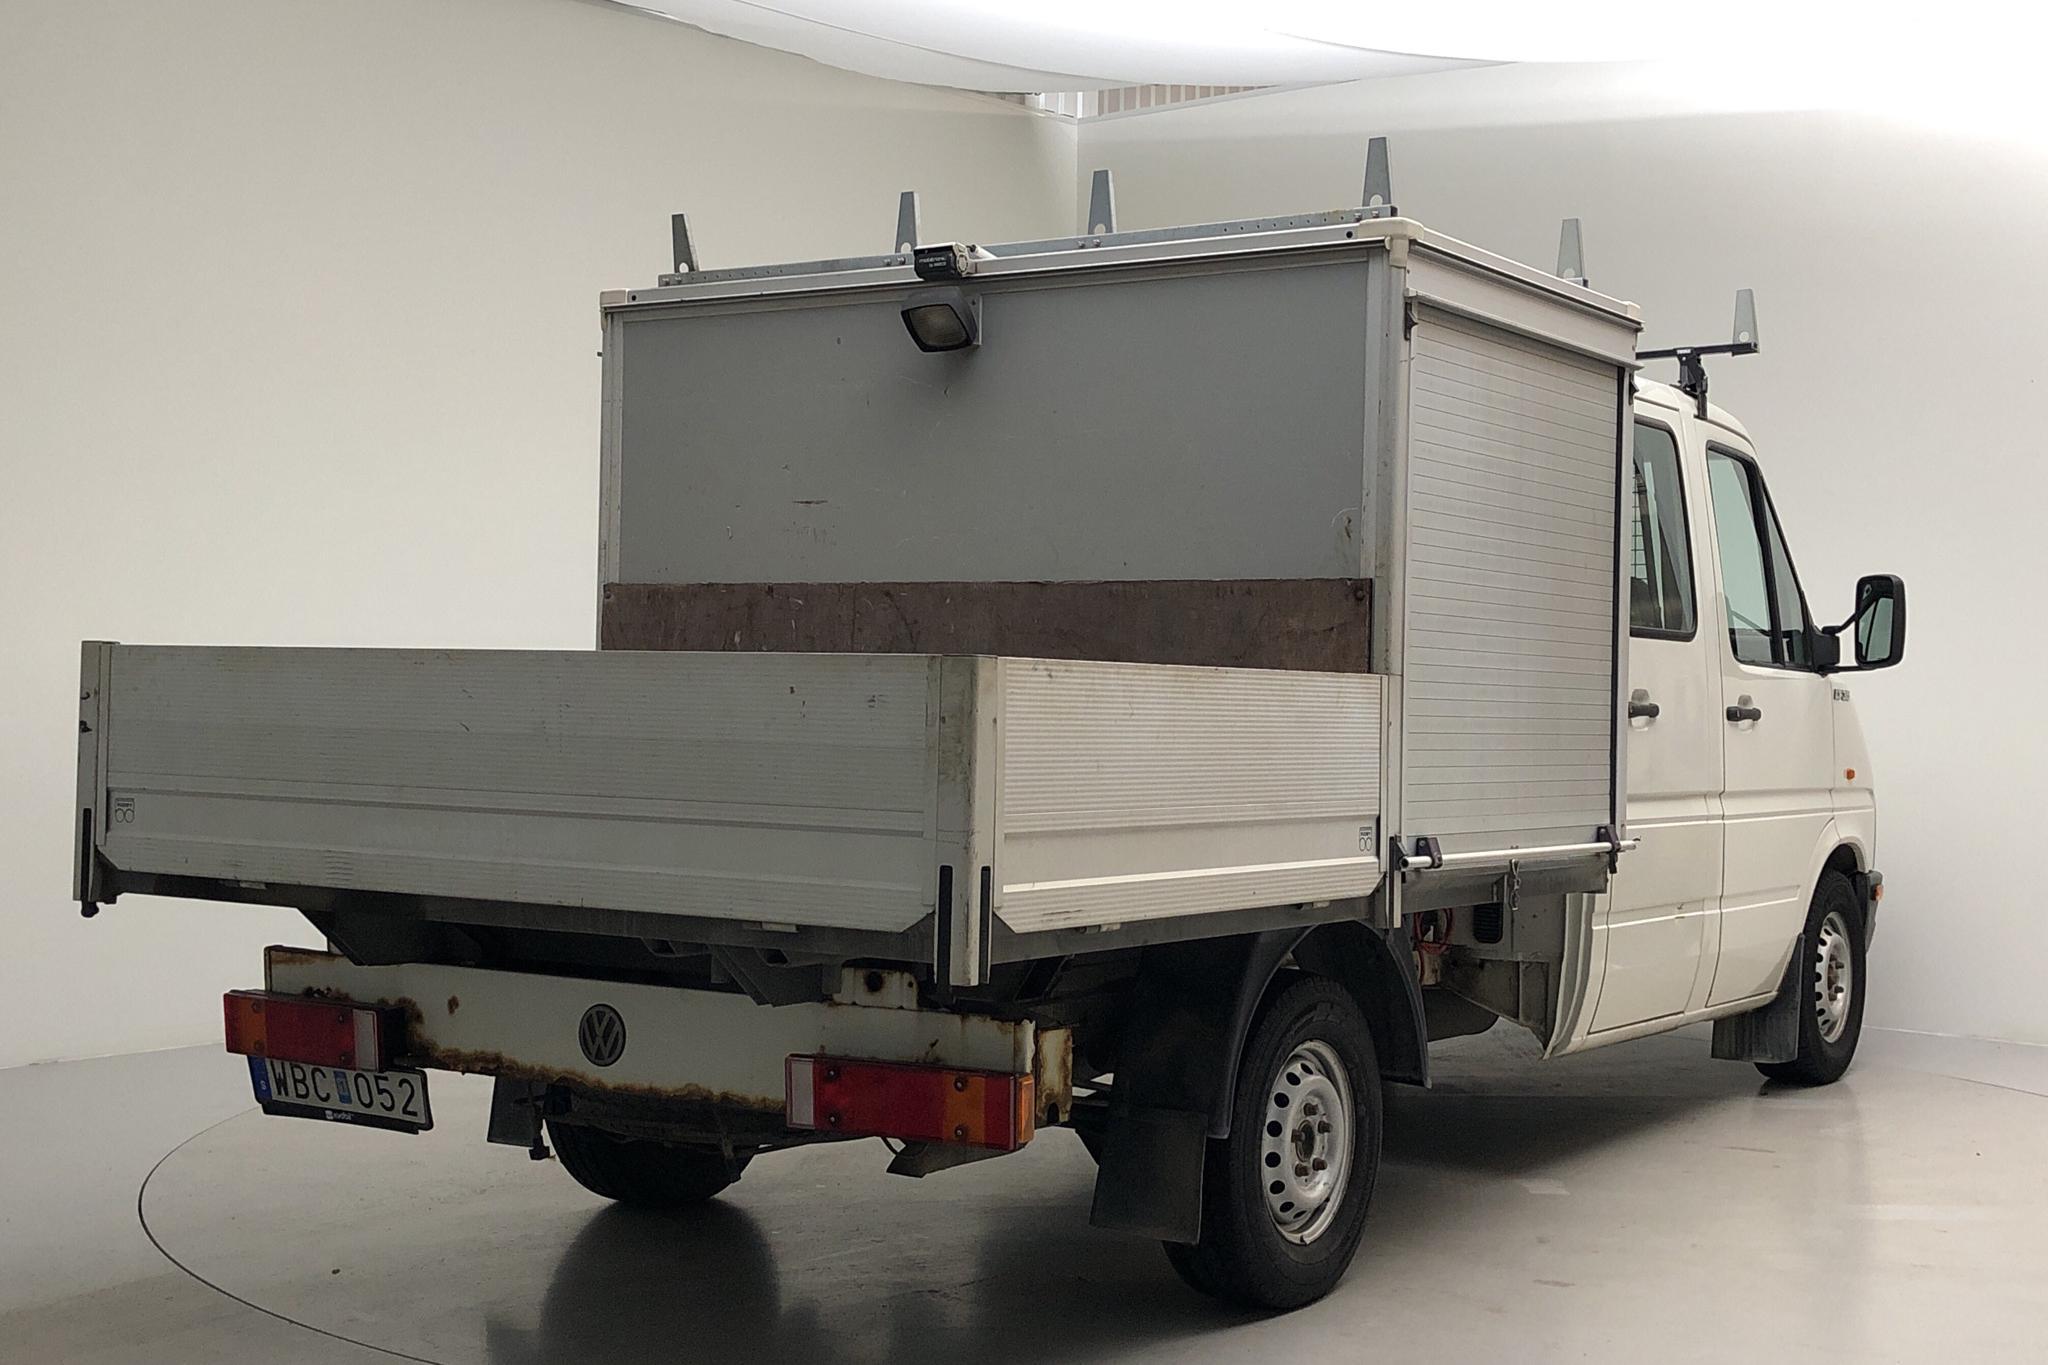 VW LT 35 2.5 TDI Pickup (109hk) - 132 860 km - Manual - 2004